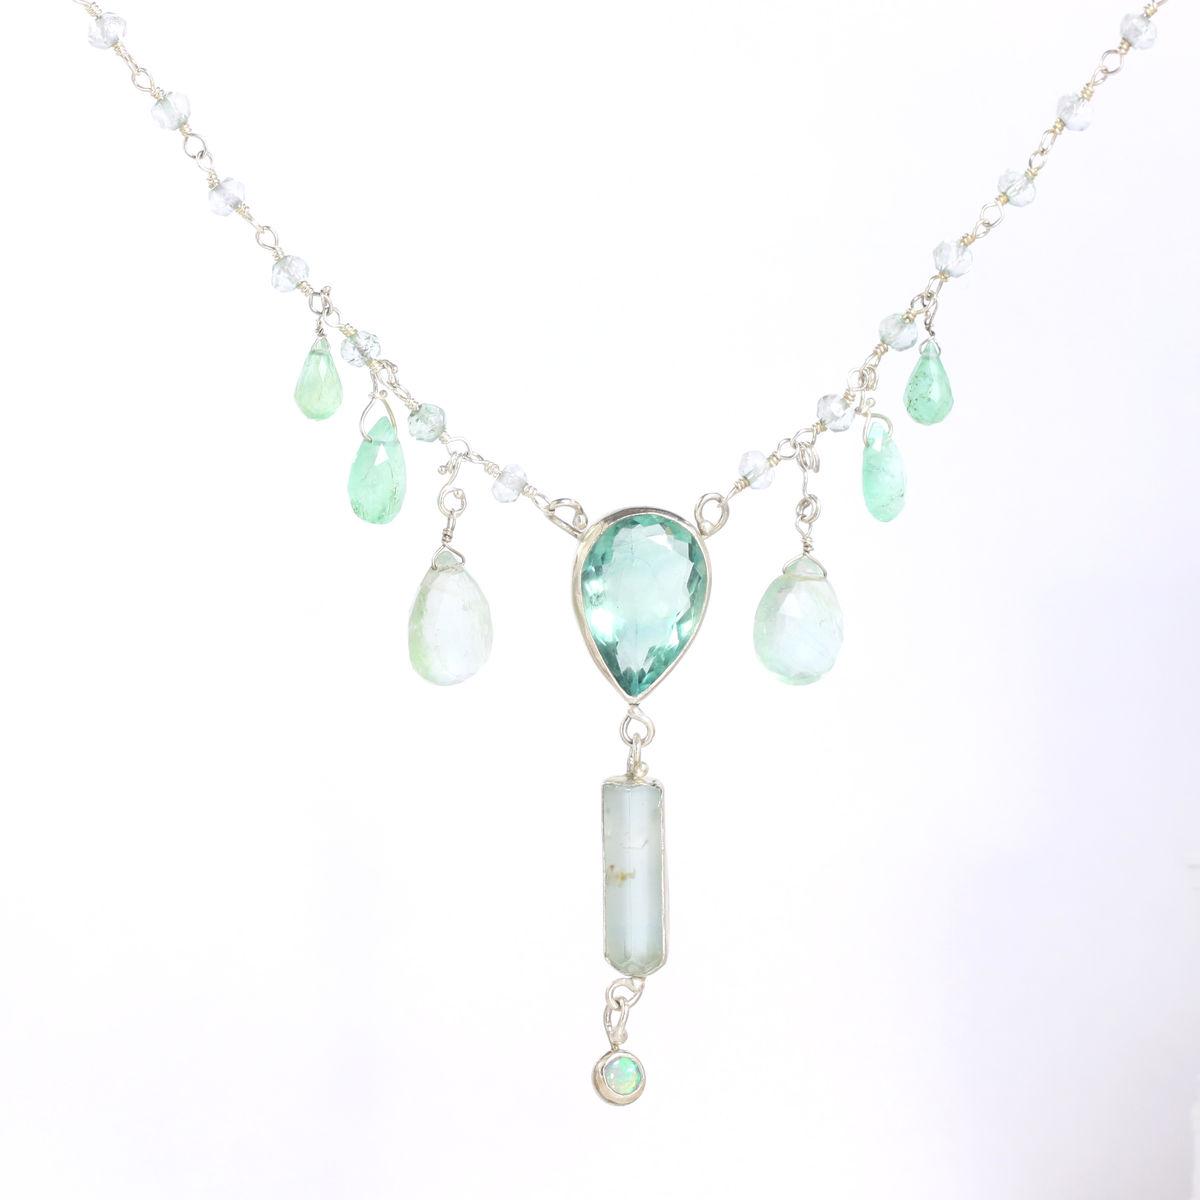 Aquamarine oval cabochon pendant leda jewel co fluorite raw aquamarine crystal necklace pendant with emeralds opal green amethyst aloadofball Images